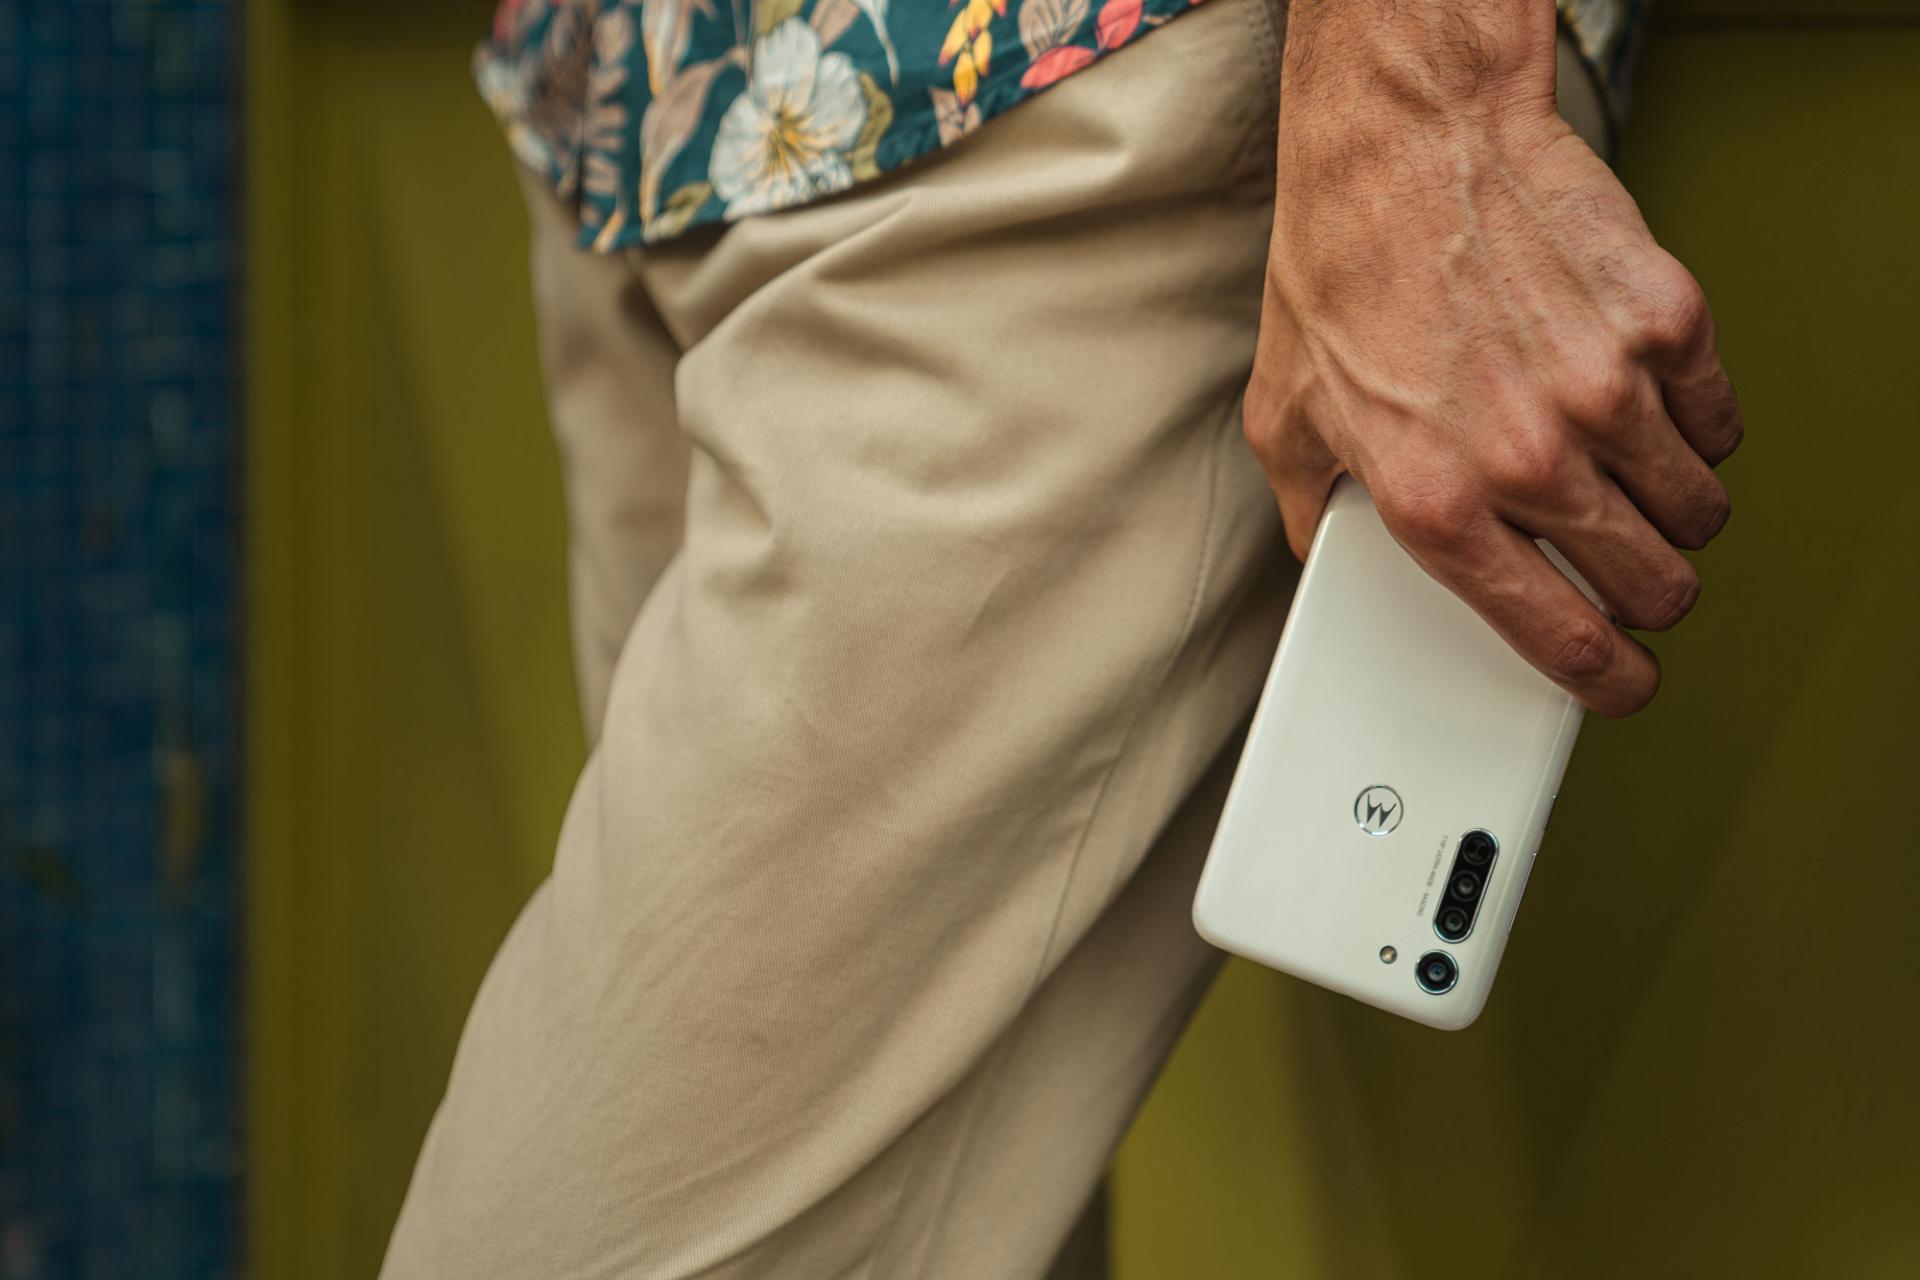 Американско-китайский смартфон схорошими характеристиками продают за11990 рублей